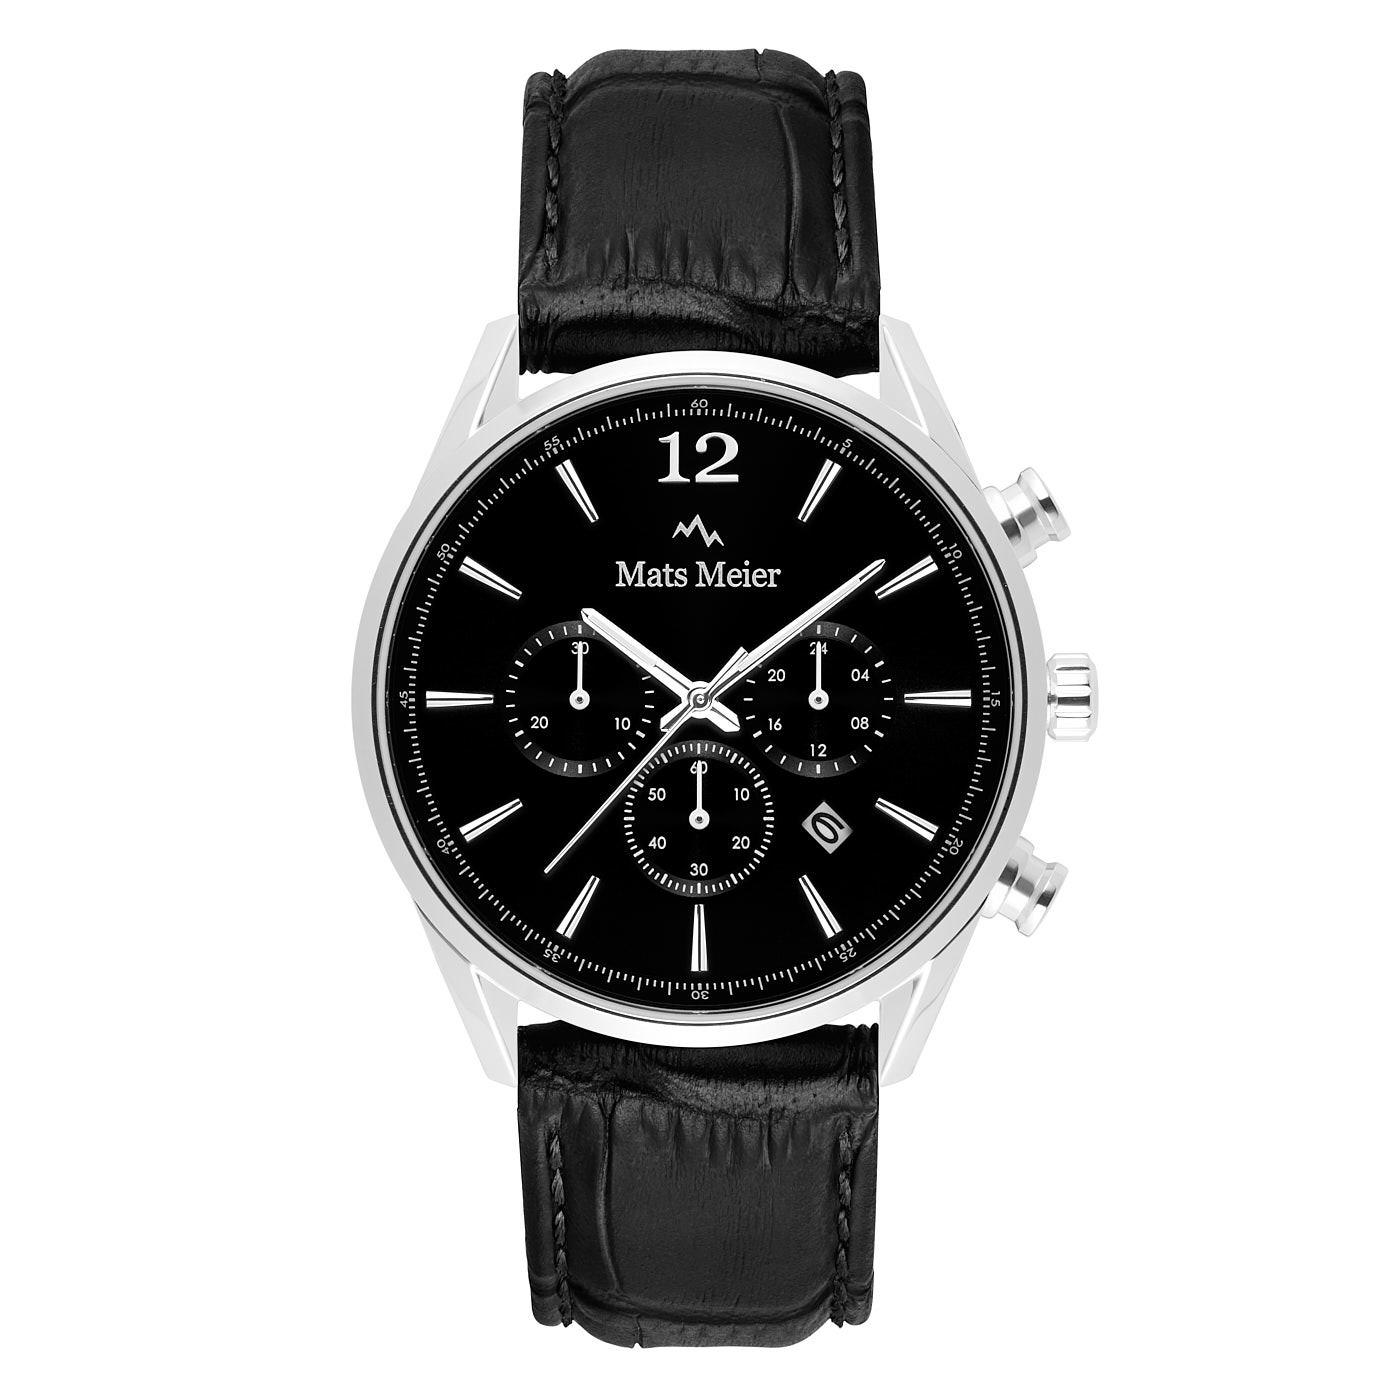 Mats Meier Grand Cornier Chronograph schwarz/schwarz